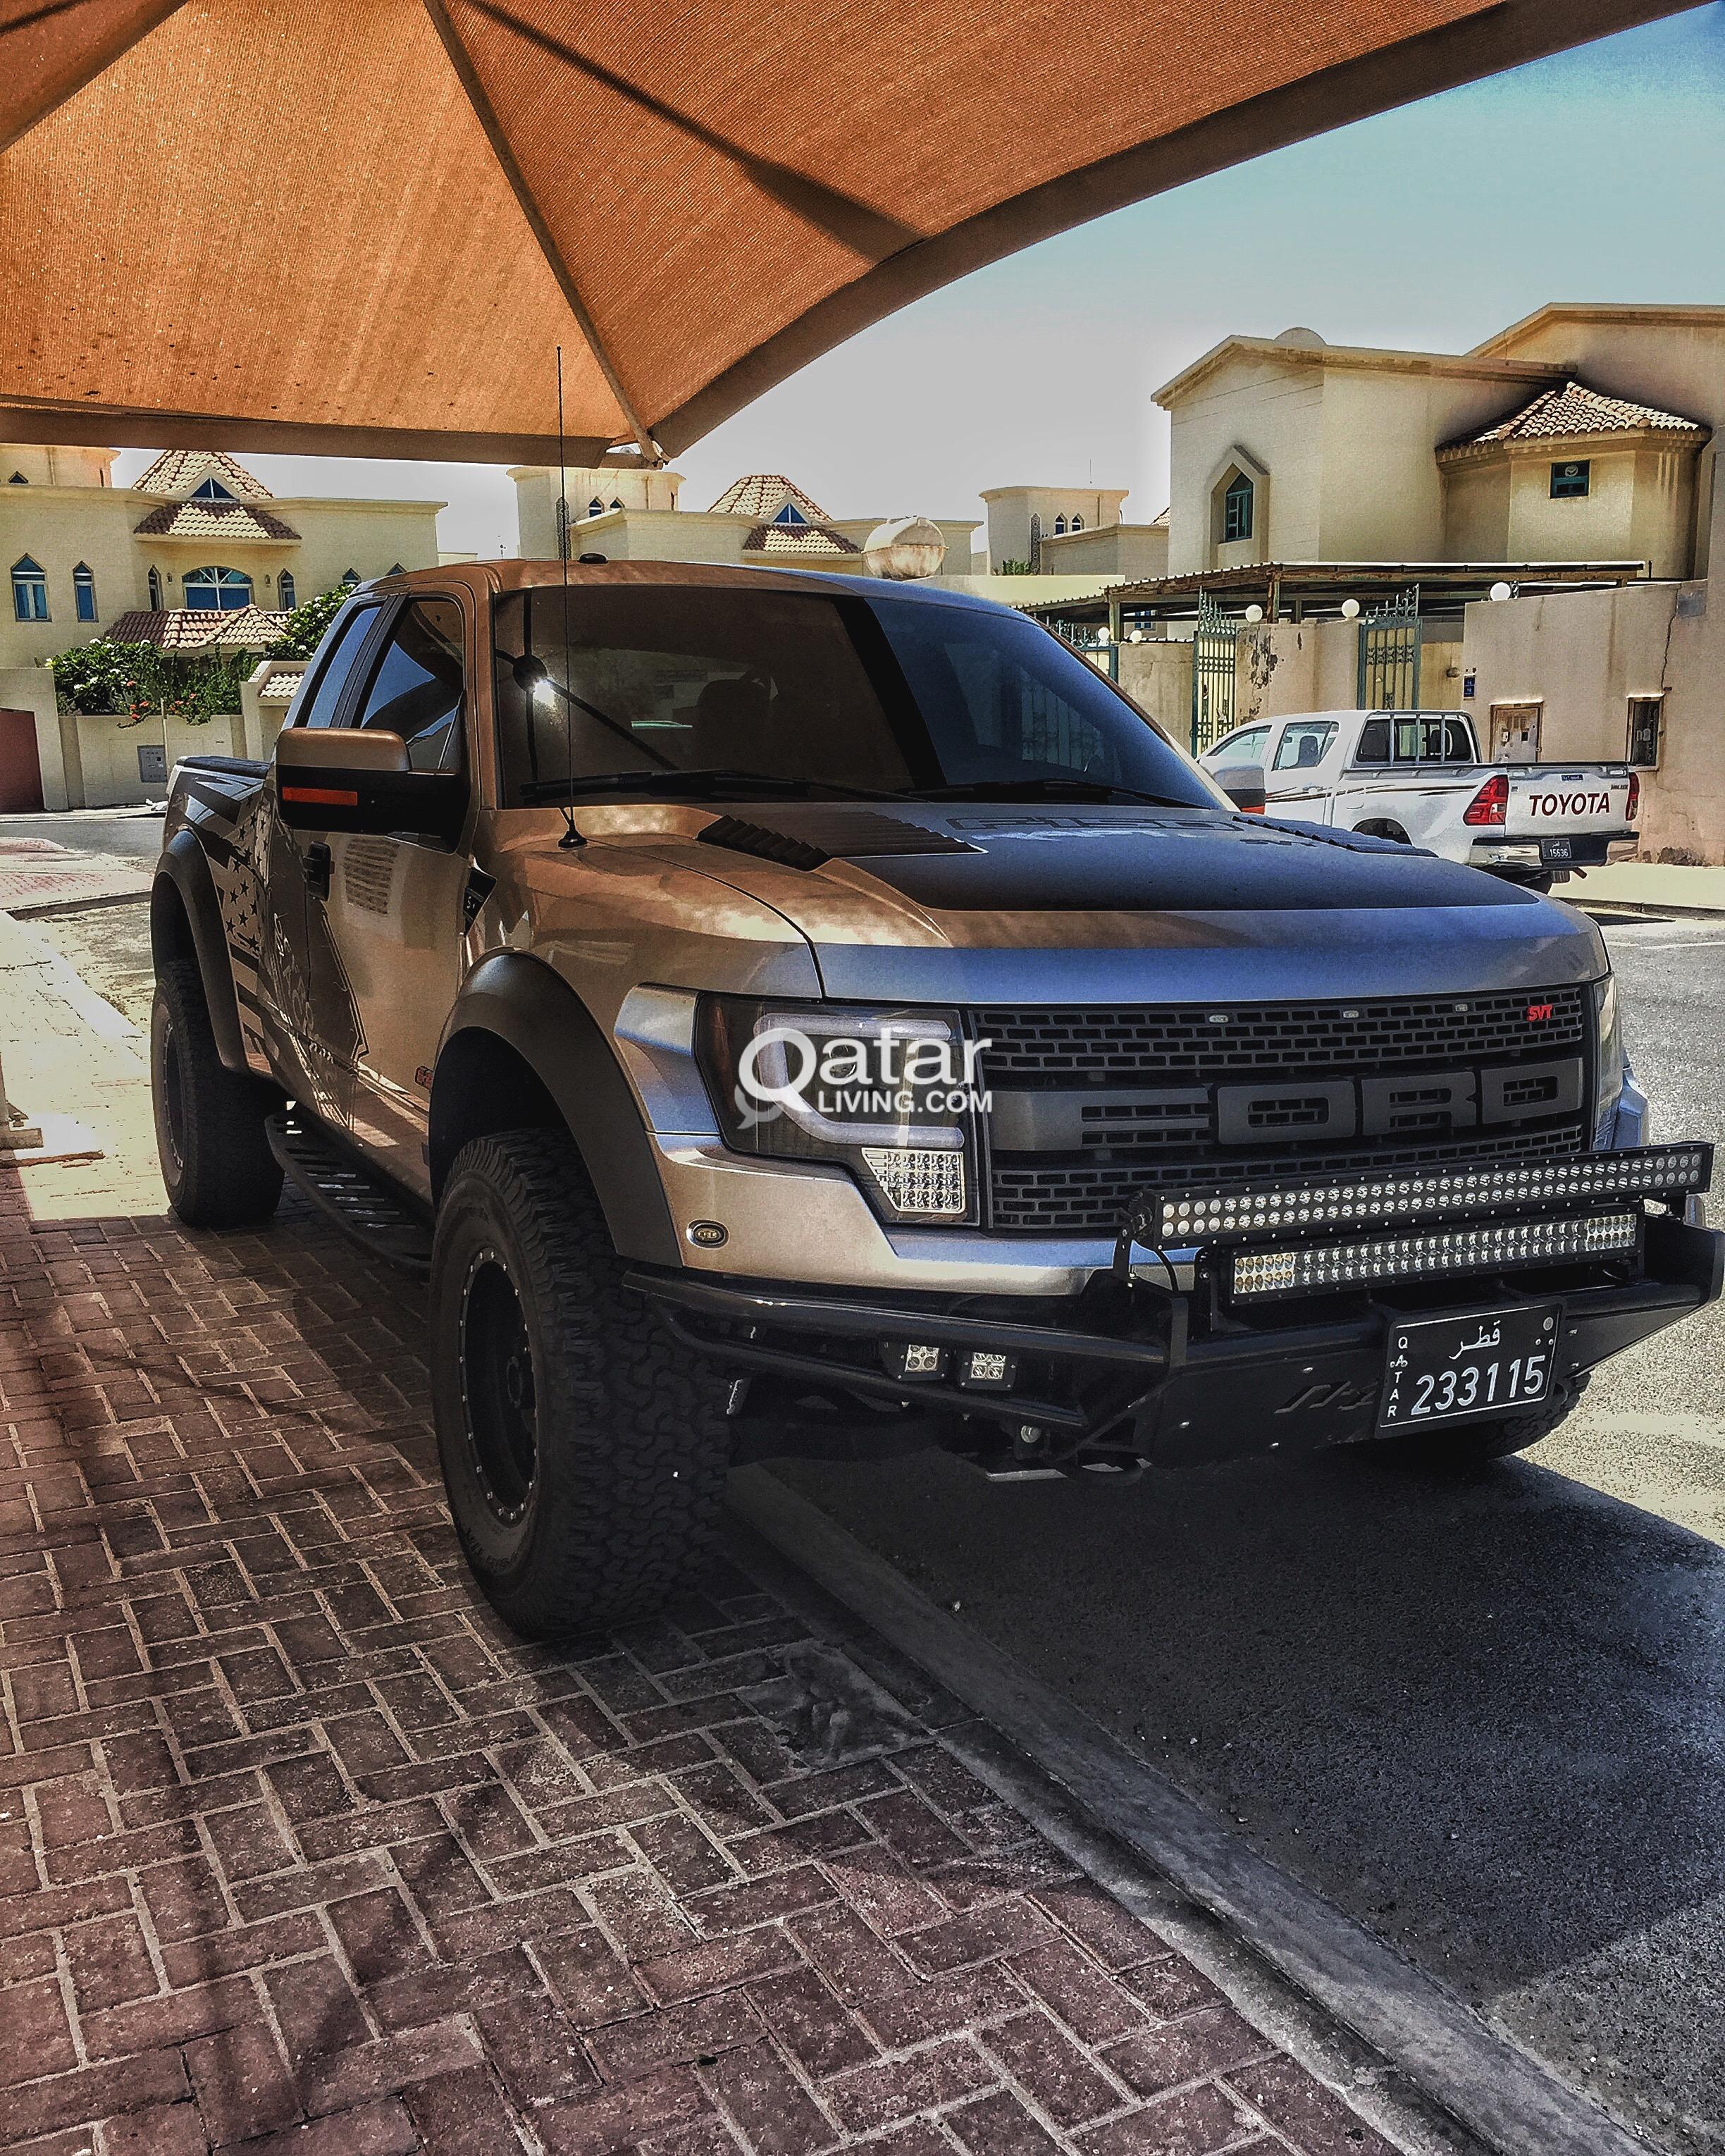 Ford Raptor 2012 For Sale Qatar Living